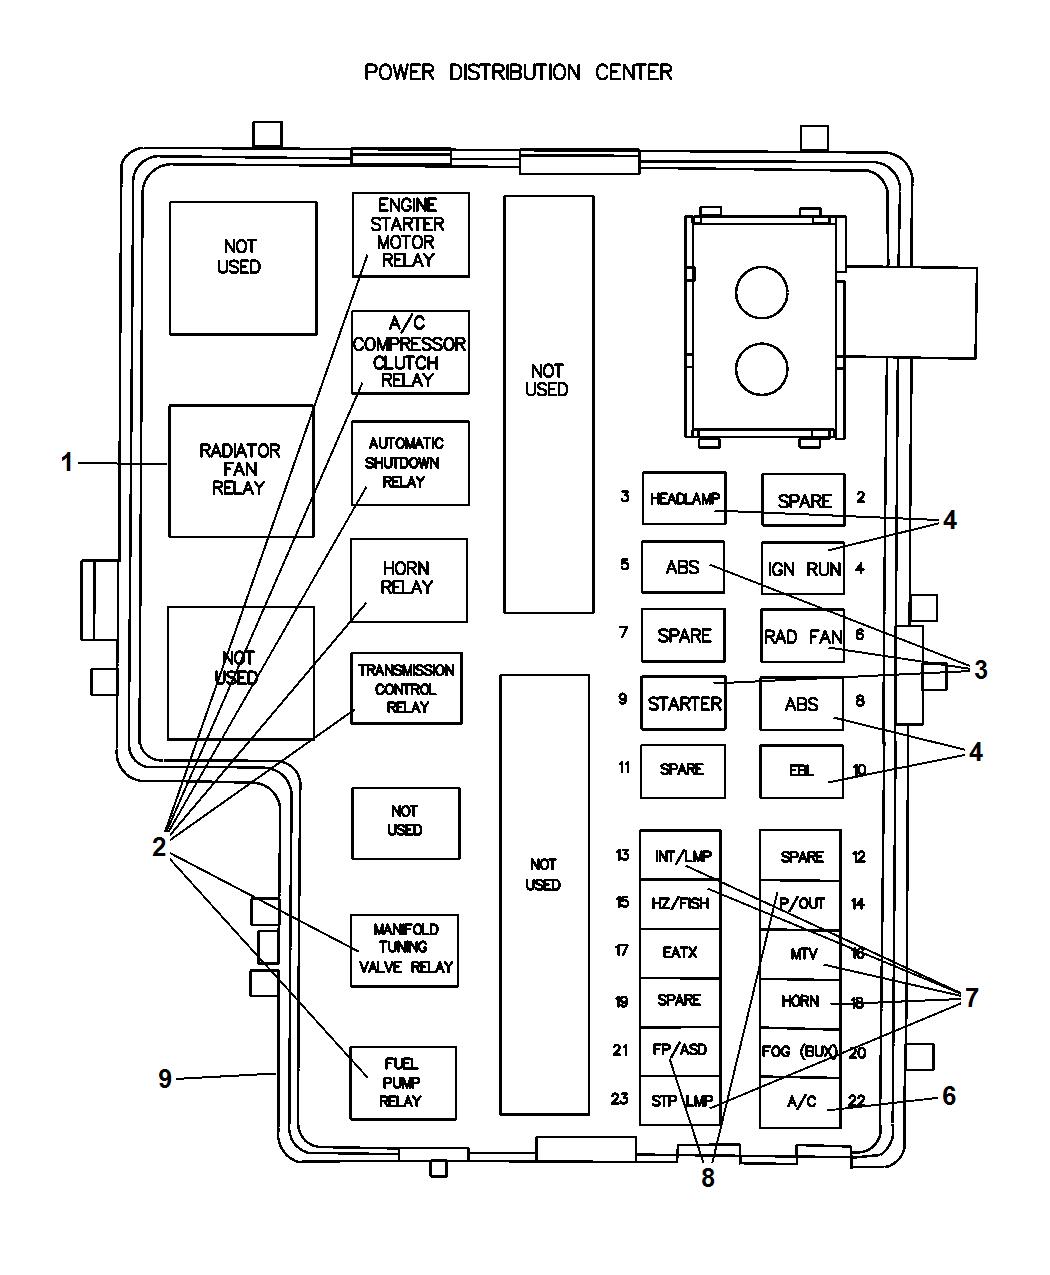 [SCHEMATICS_44OR]  SS_5207] 1998 Dodge Neon 20 Power Distribution Center Fuse Box Diagram | 2003 Dodge Neon Fuse Diagram |  | Xeira Attr Dome Carn Vira Mohammedshrine Librar Wiring 101